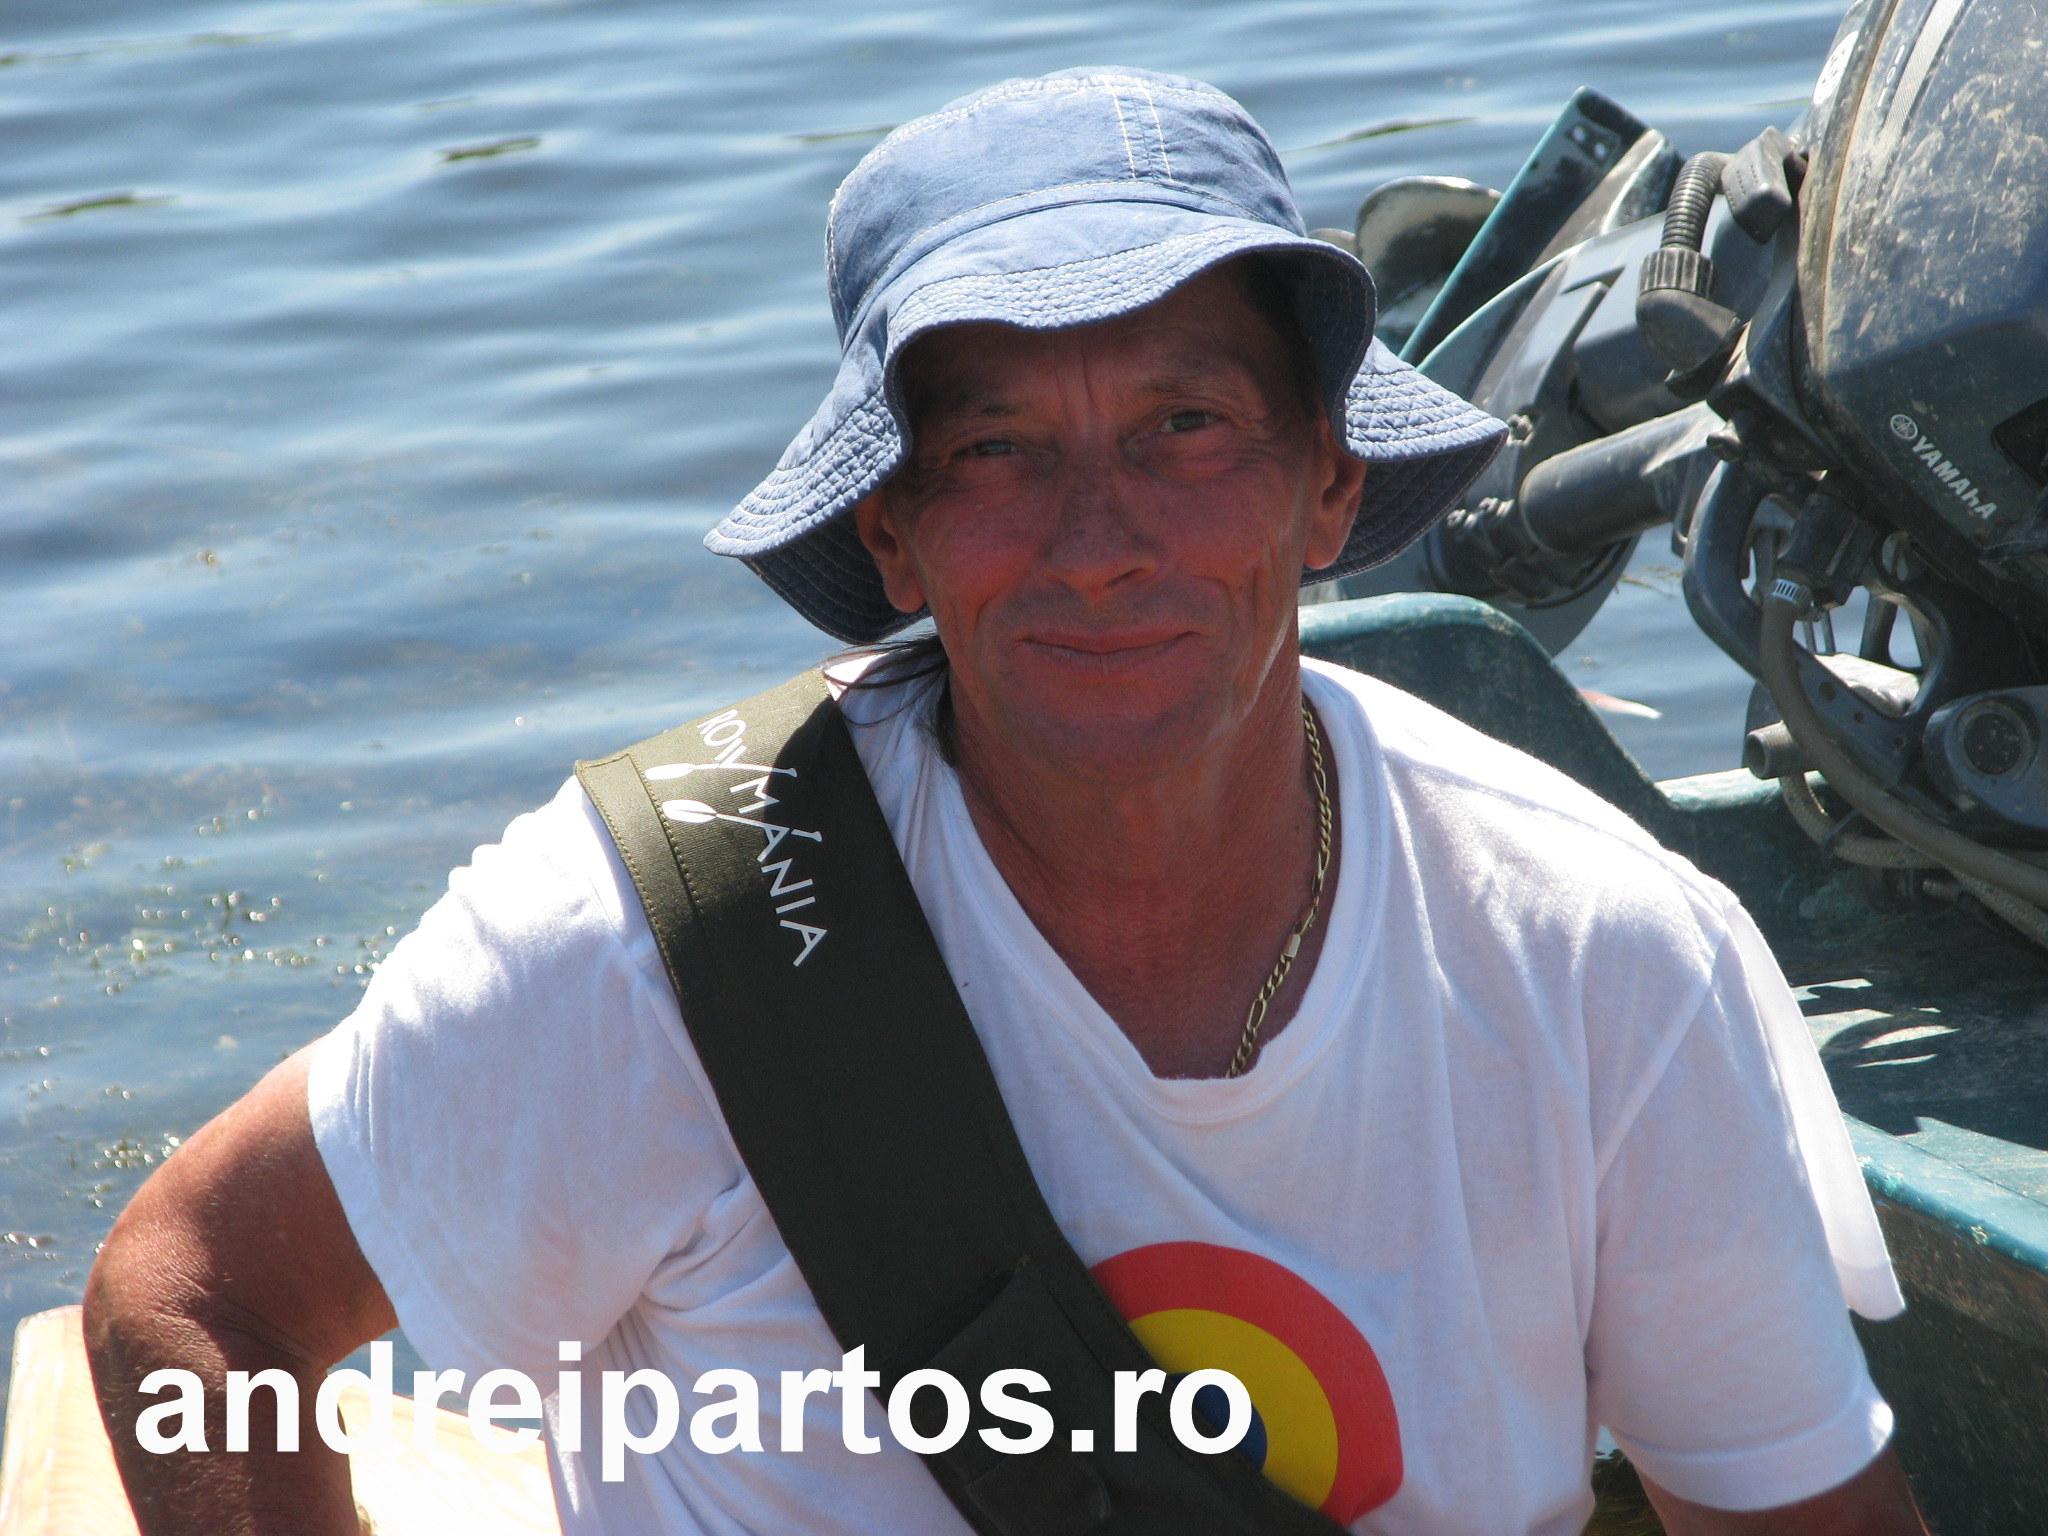 A murit Ivan Patzaichin. Dumnezeu să-l odihnească în pace!